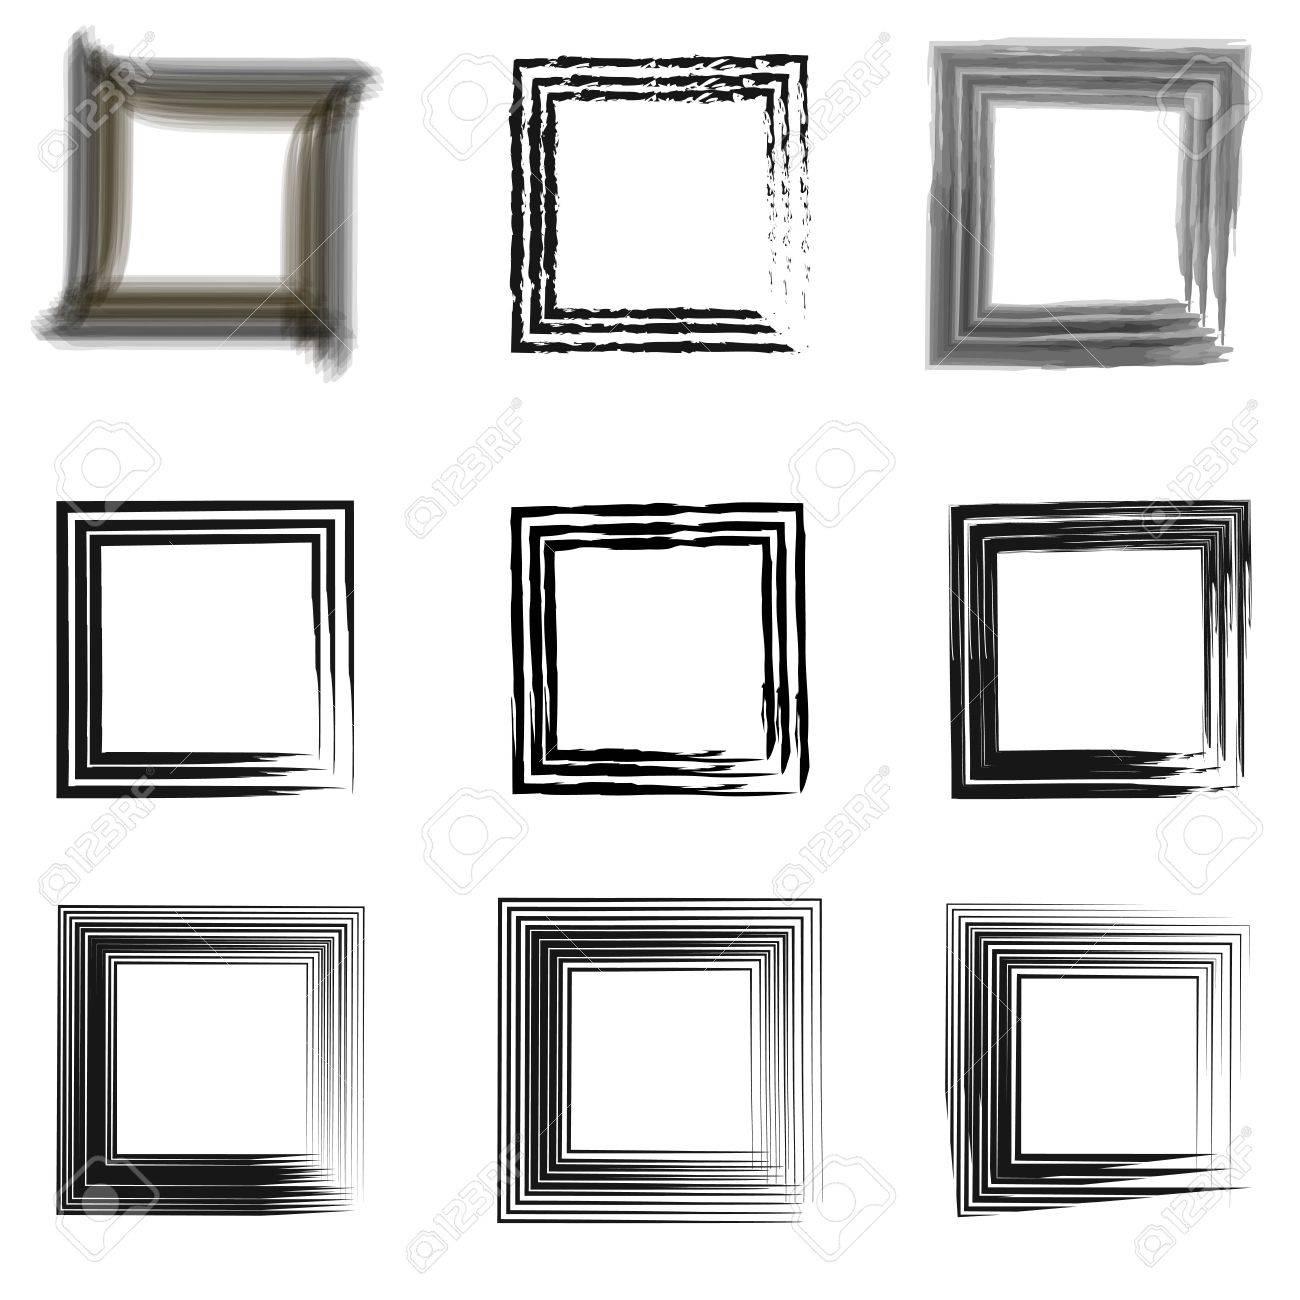 Set Of Vintage Frames For Photos, Retro Frame Template For Images ...